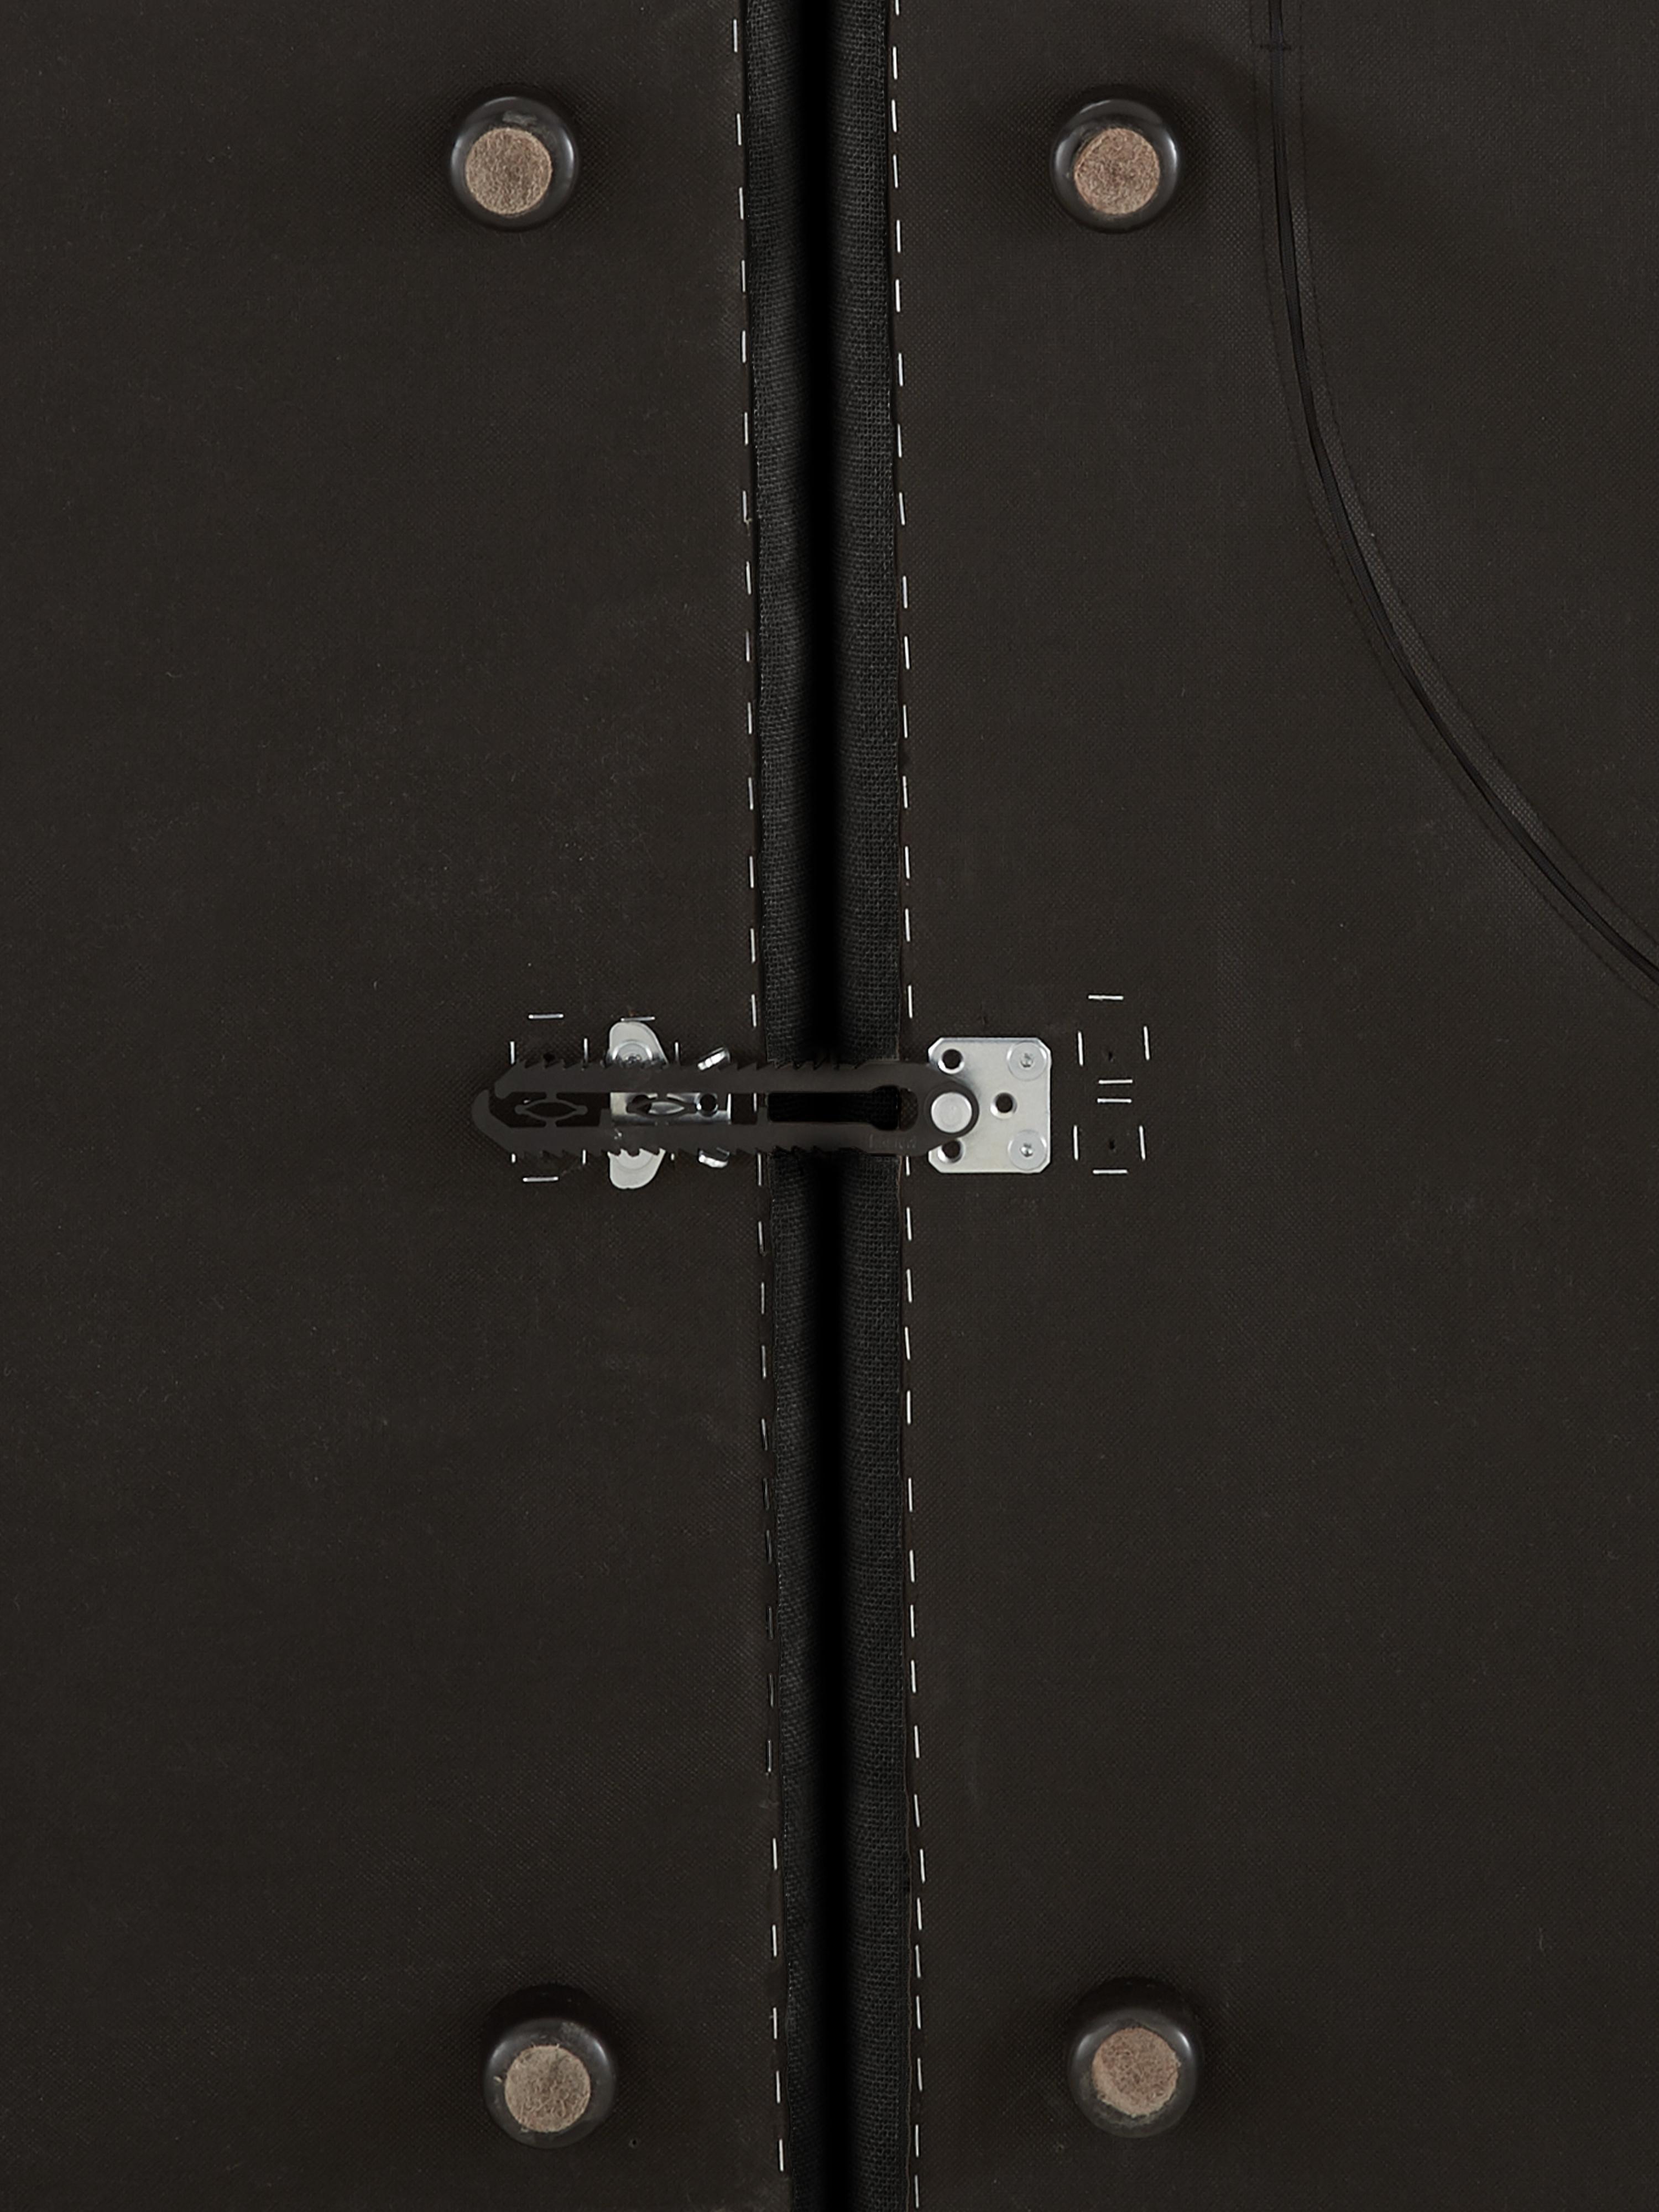 Modulares Sofa Lennon (4-Sitzer), Bezug: Polyester 35.000 Scheuert, Gestell: Massives Kiefernholz, Spe, Füße: Kunststoff, Webstoff Anthrazit, B 326 x T 119 cm